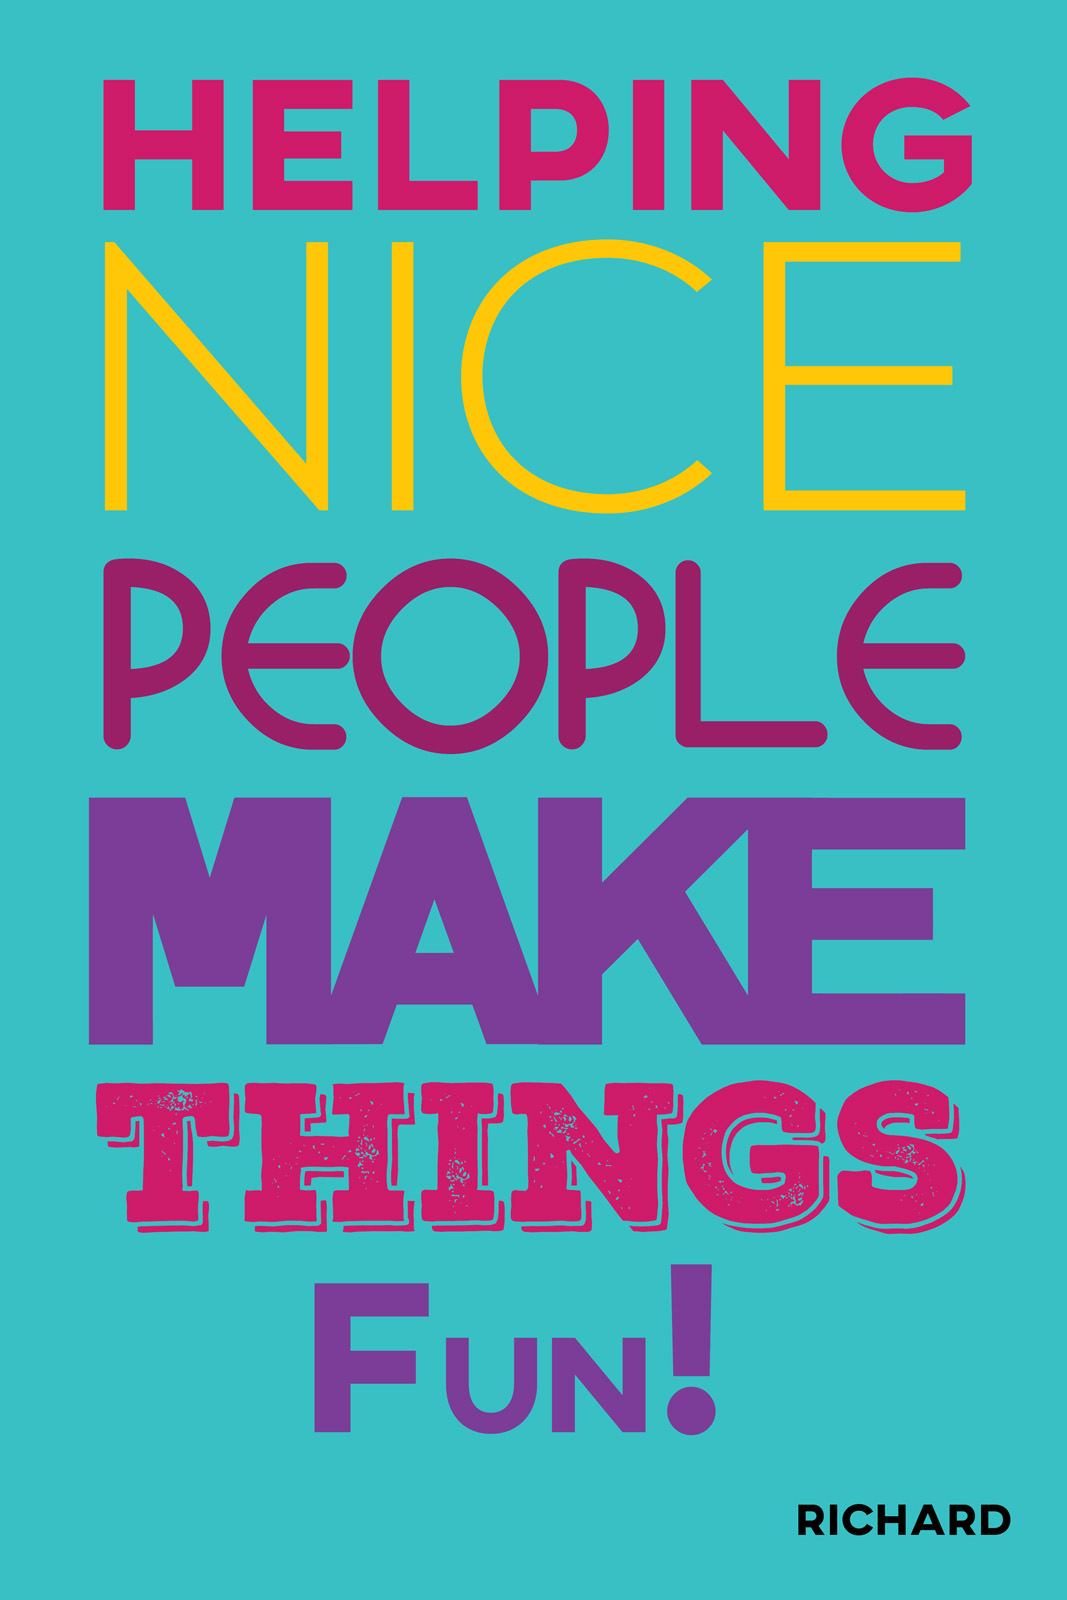 Helping nice people make things. Fun!